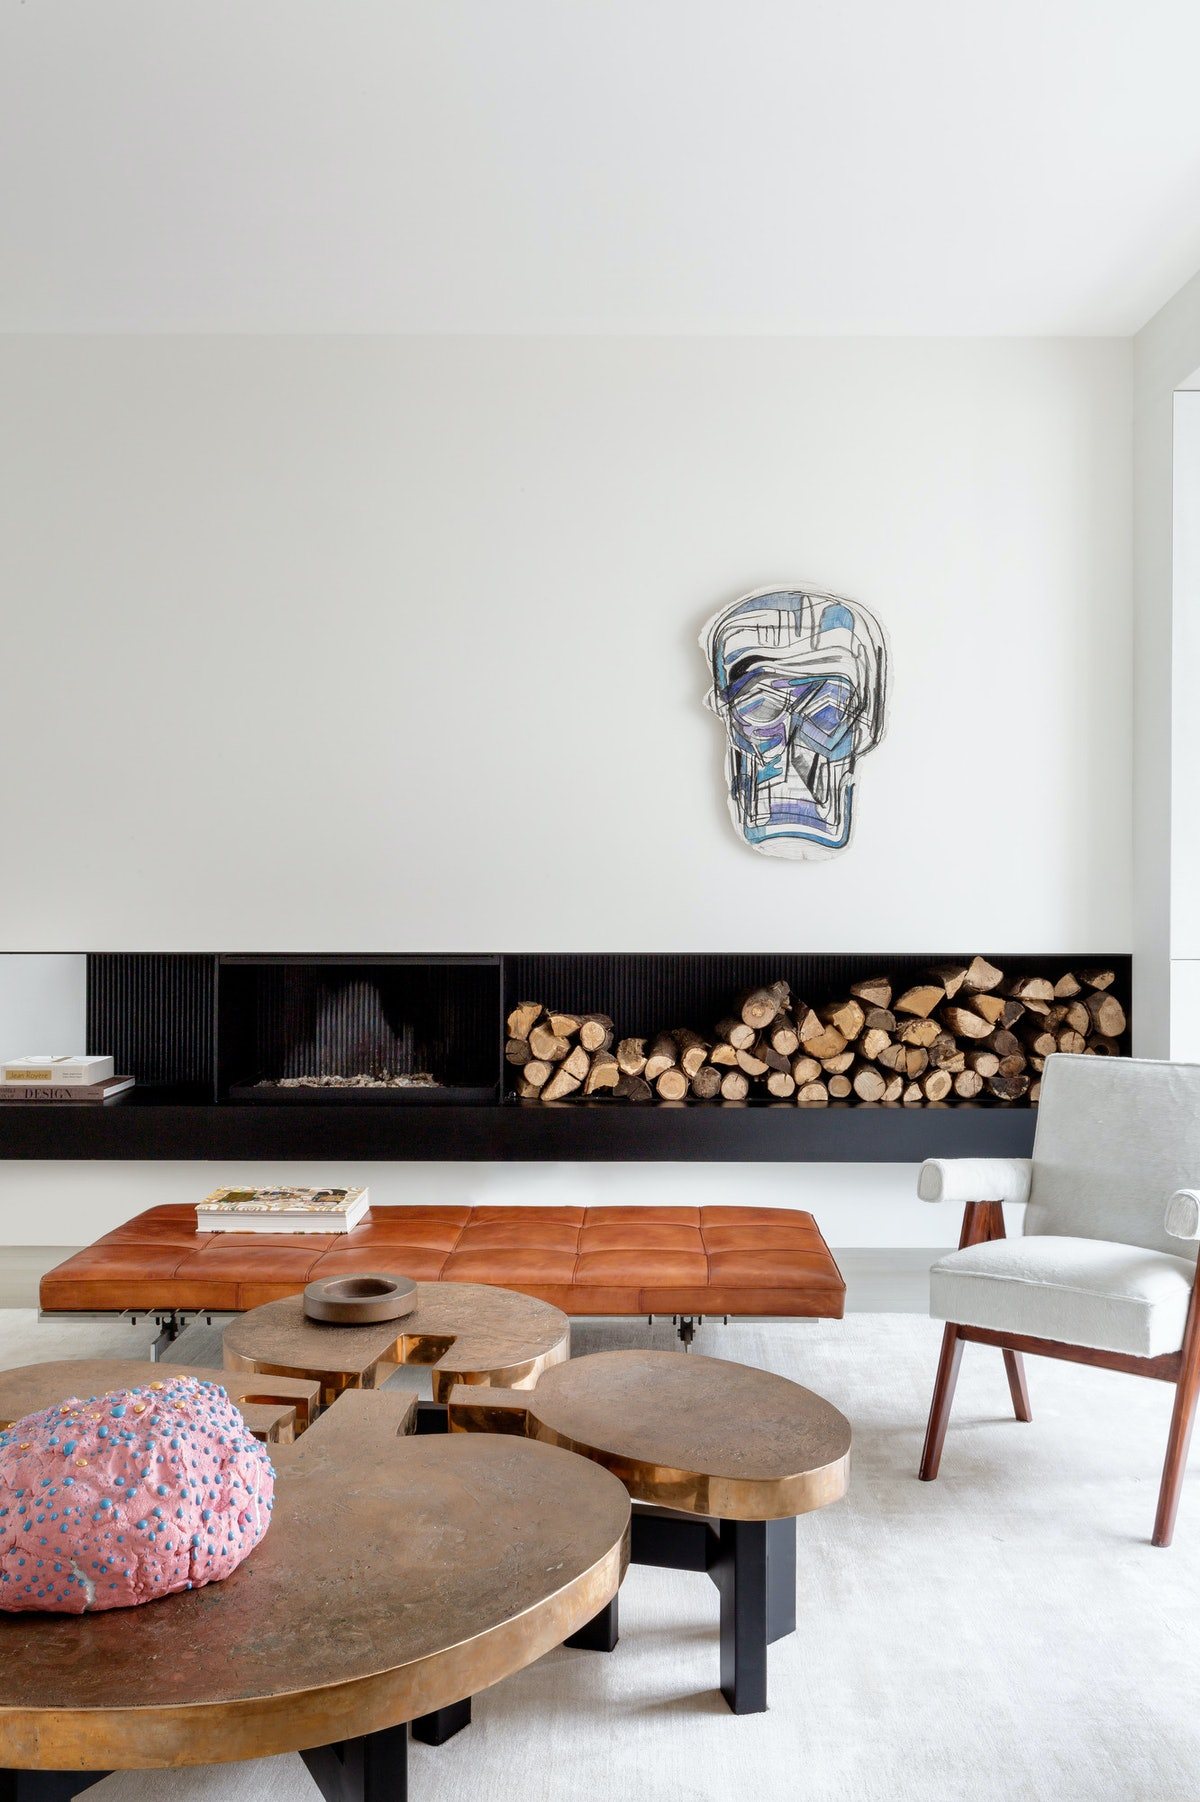 home interior, coffee table, chair, art